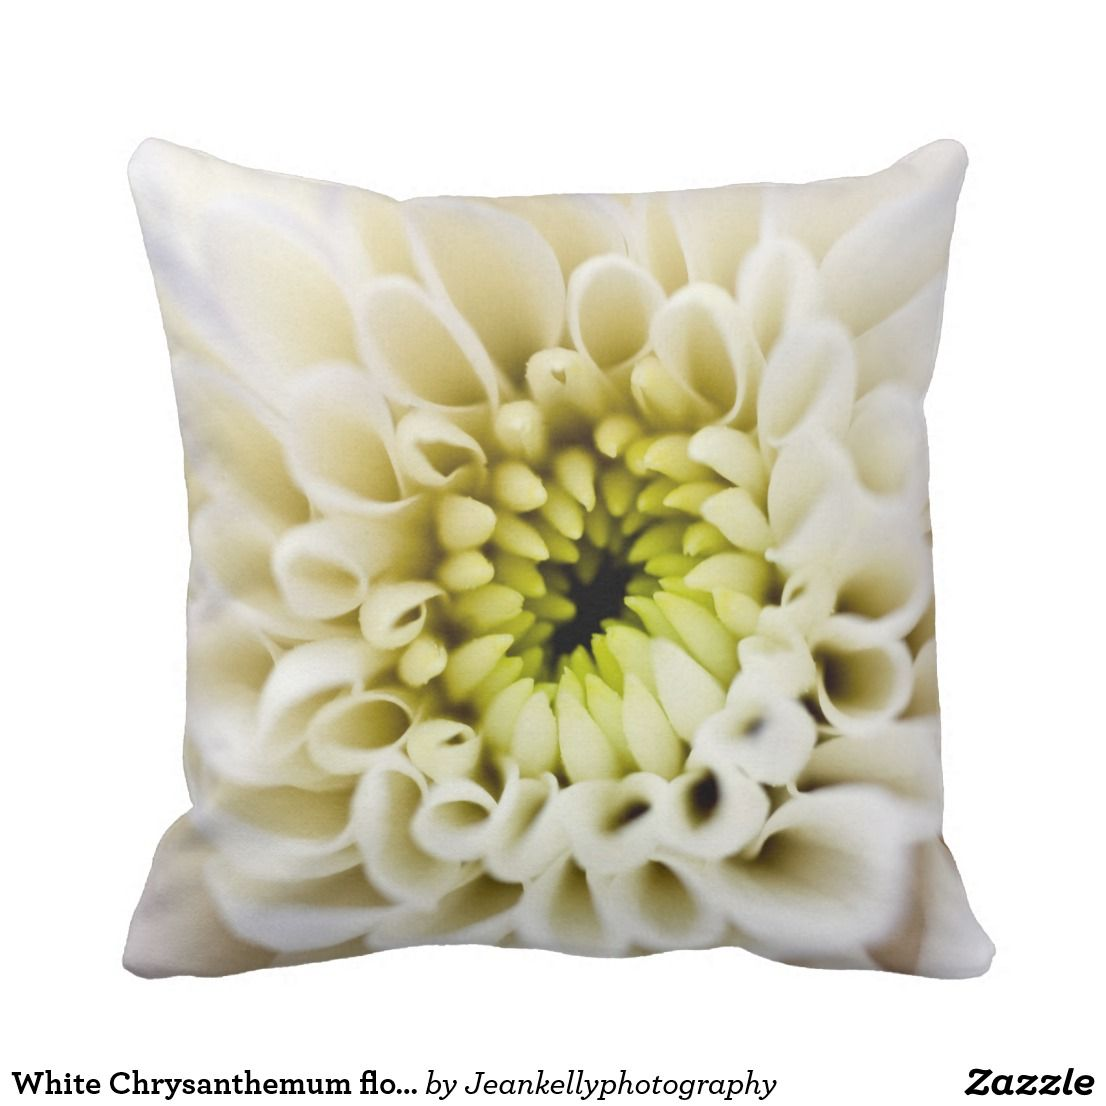 White Chrysanthemum flower Cushion in Home accessories